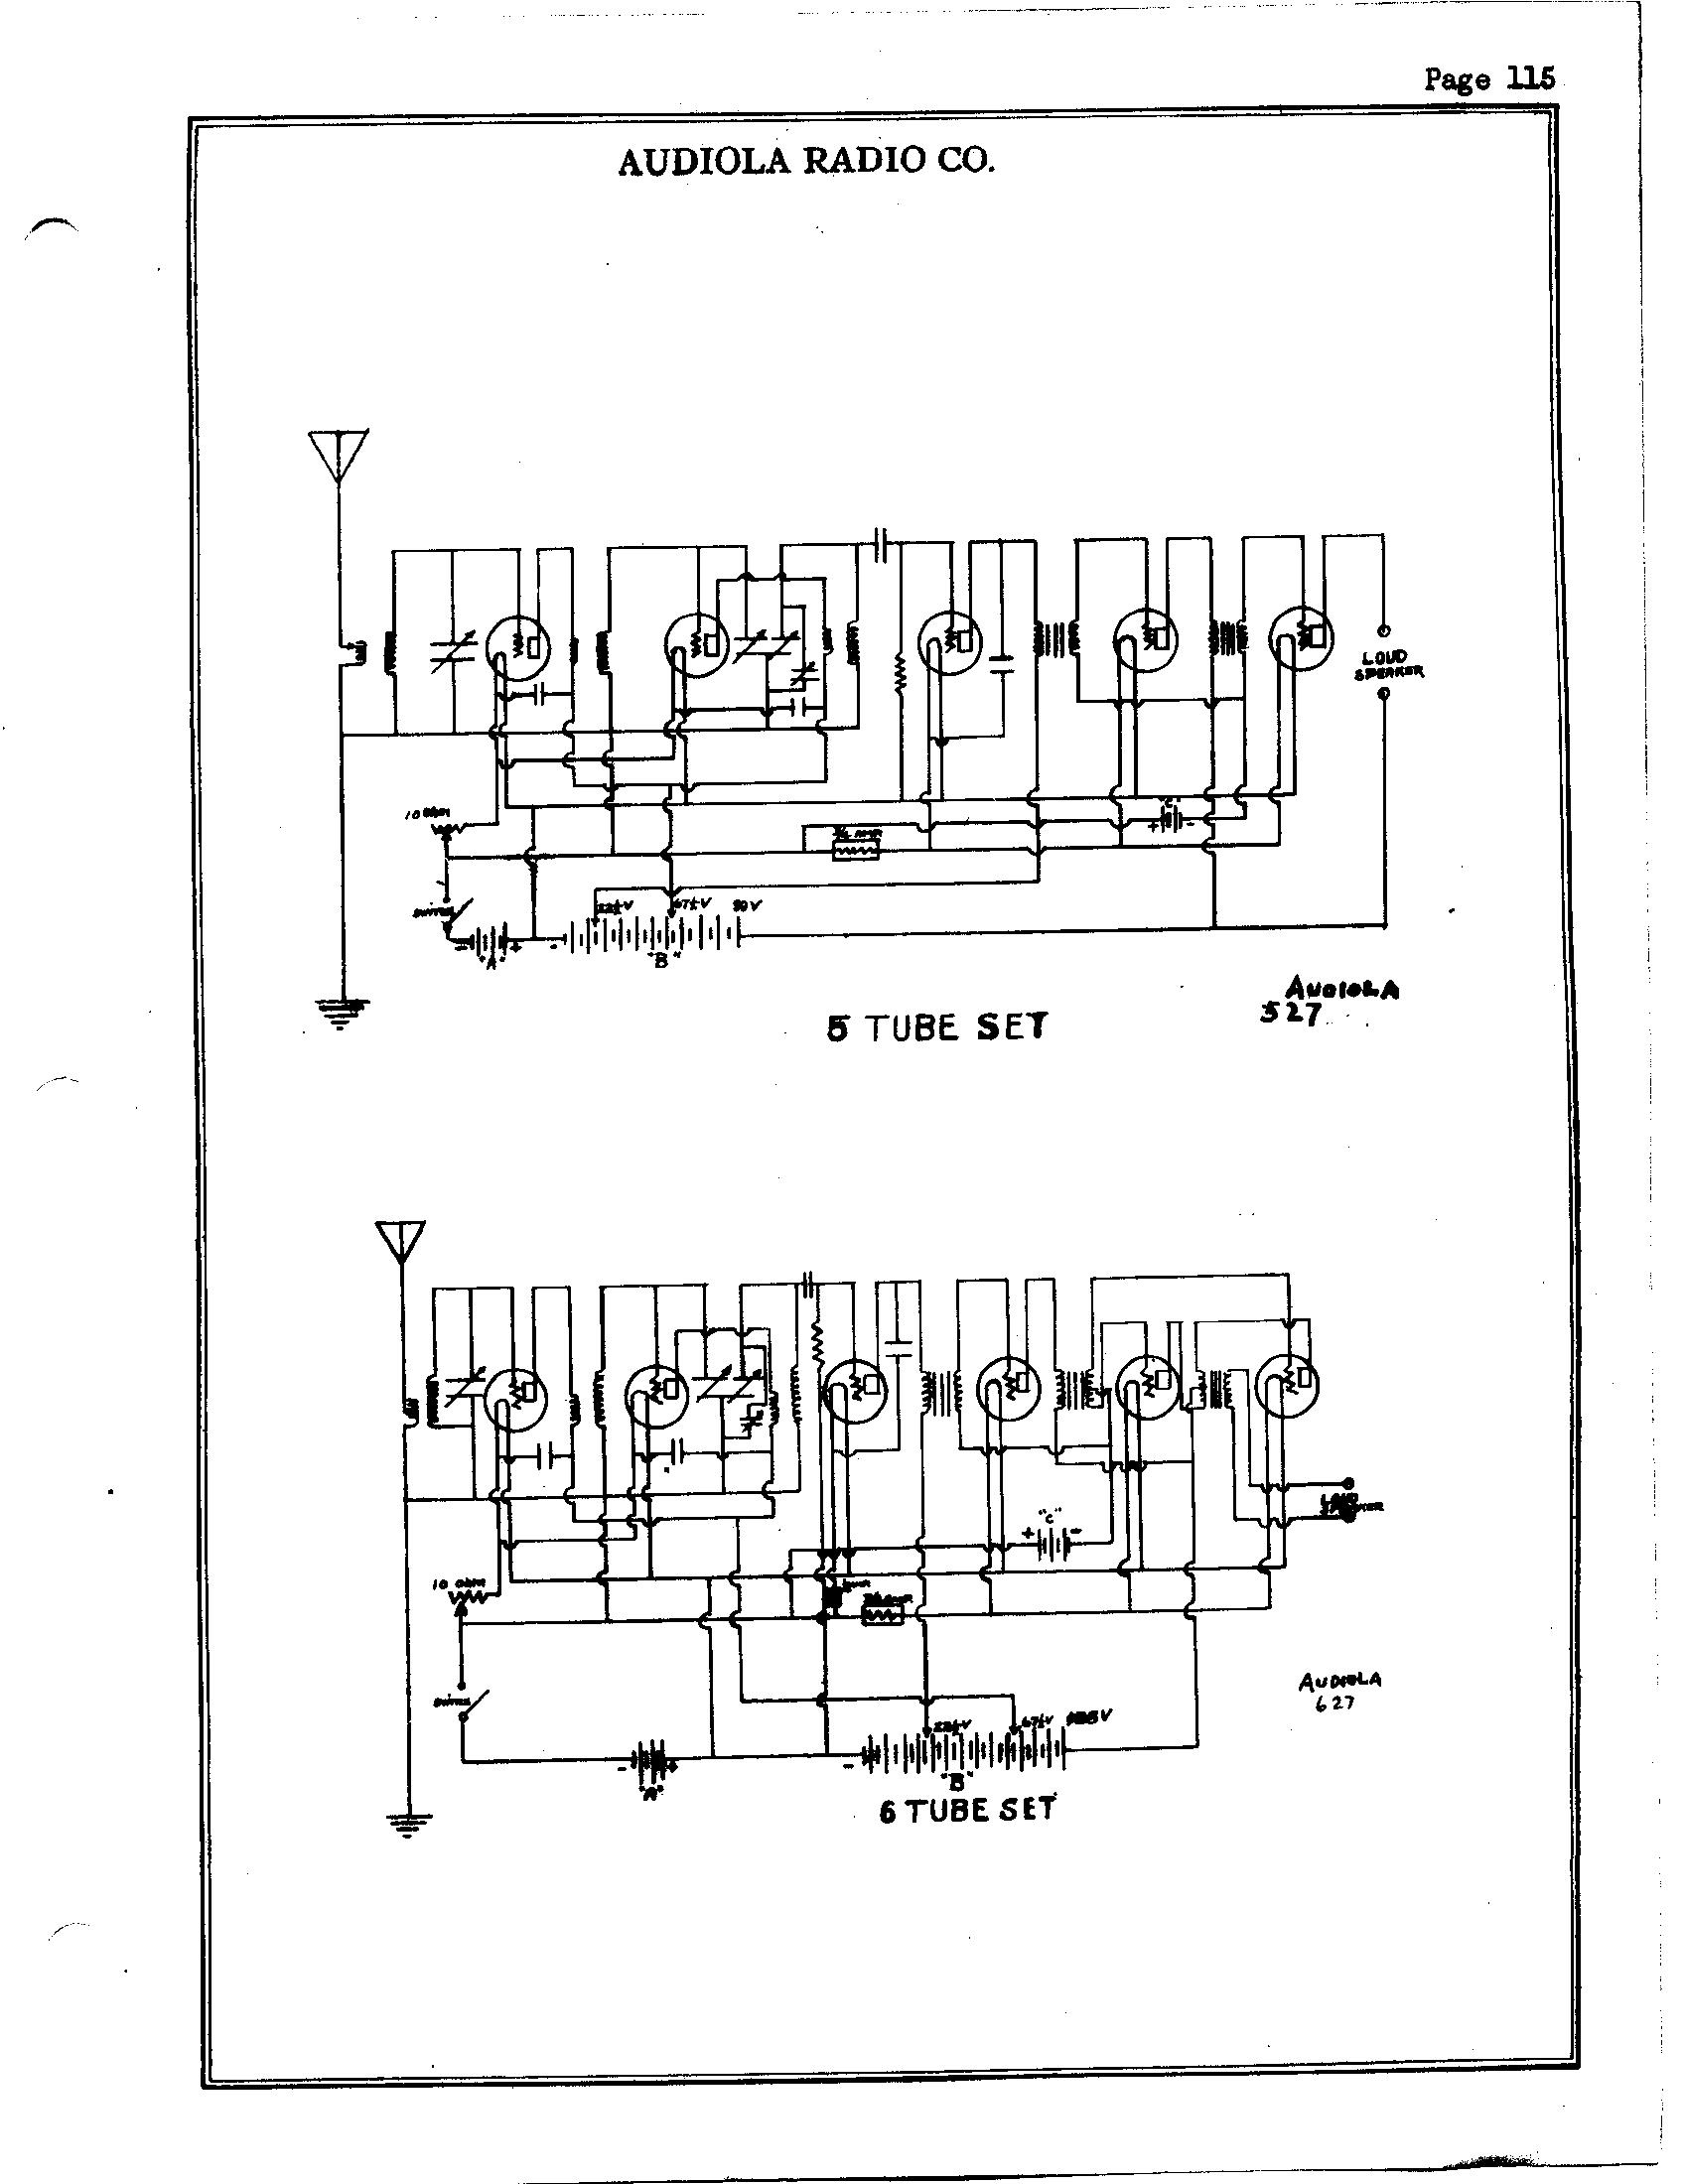 Audiola Radio Co 627 6 Tube